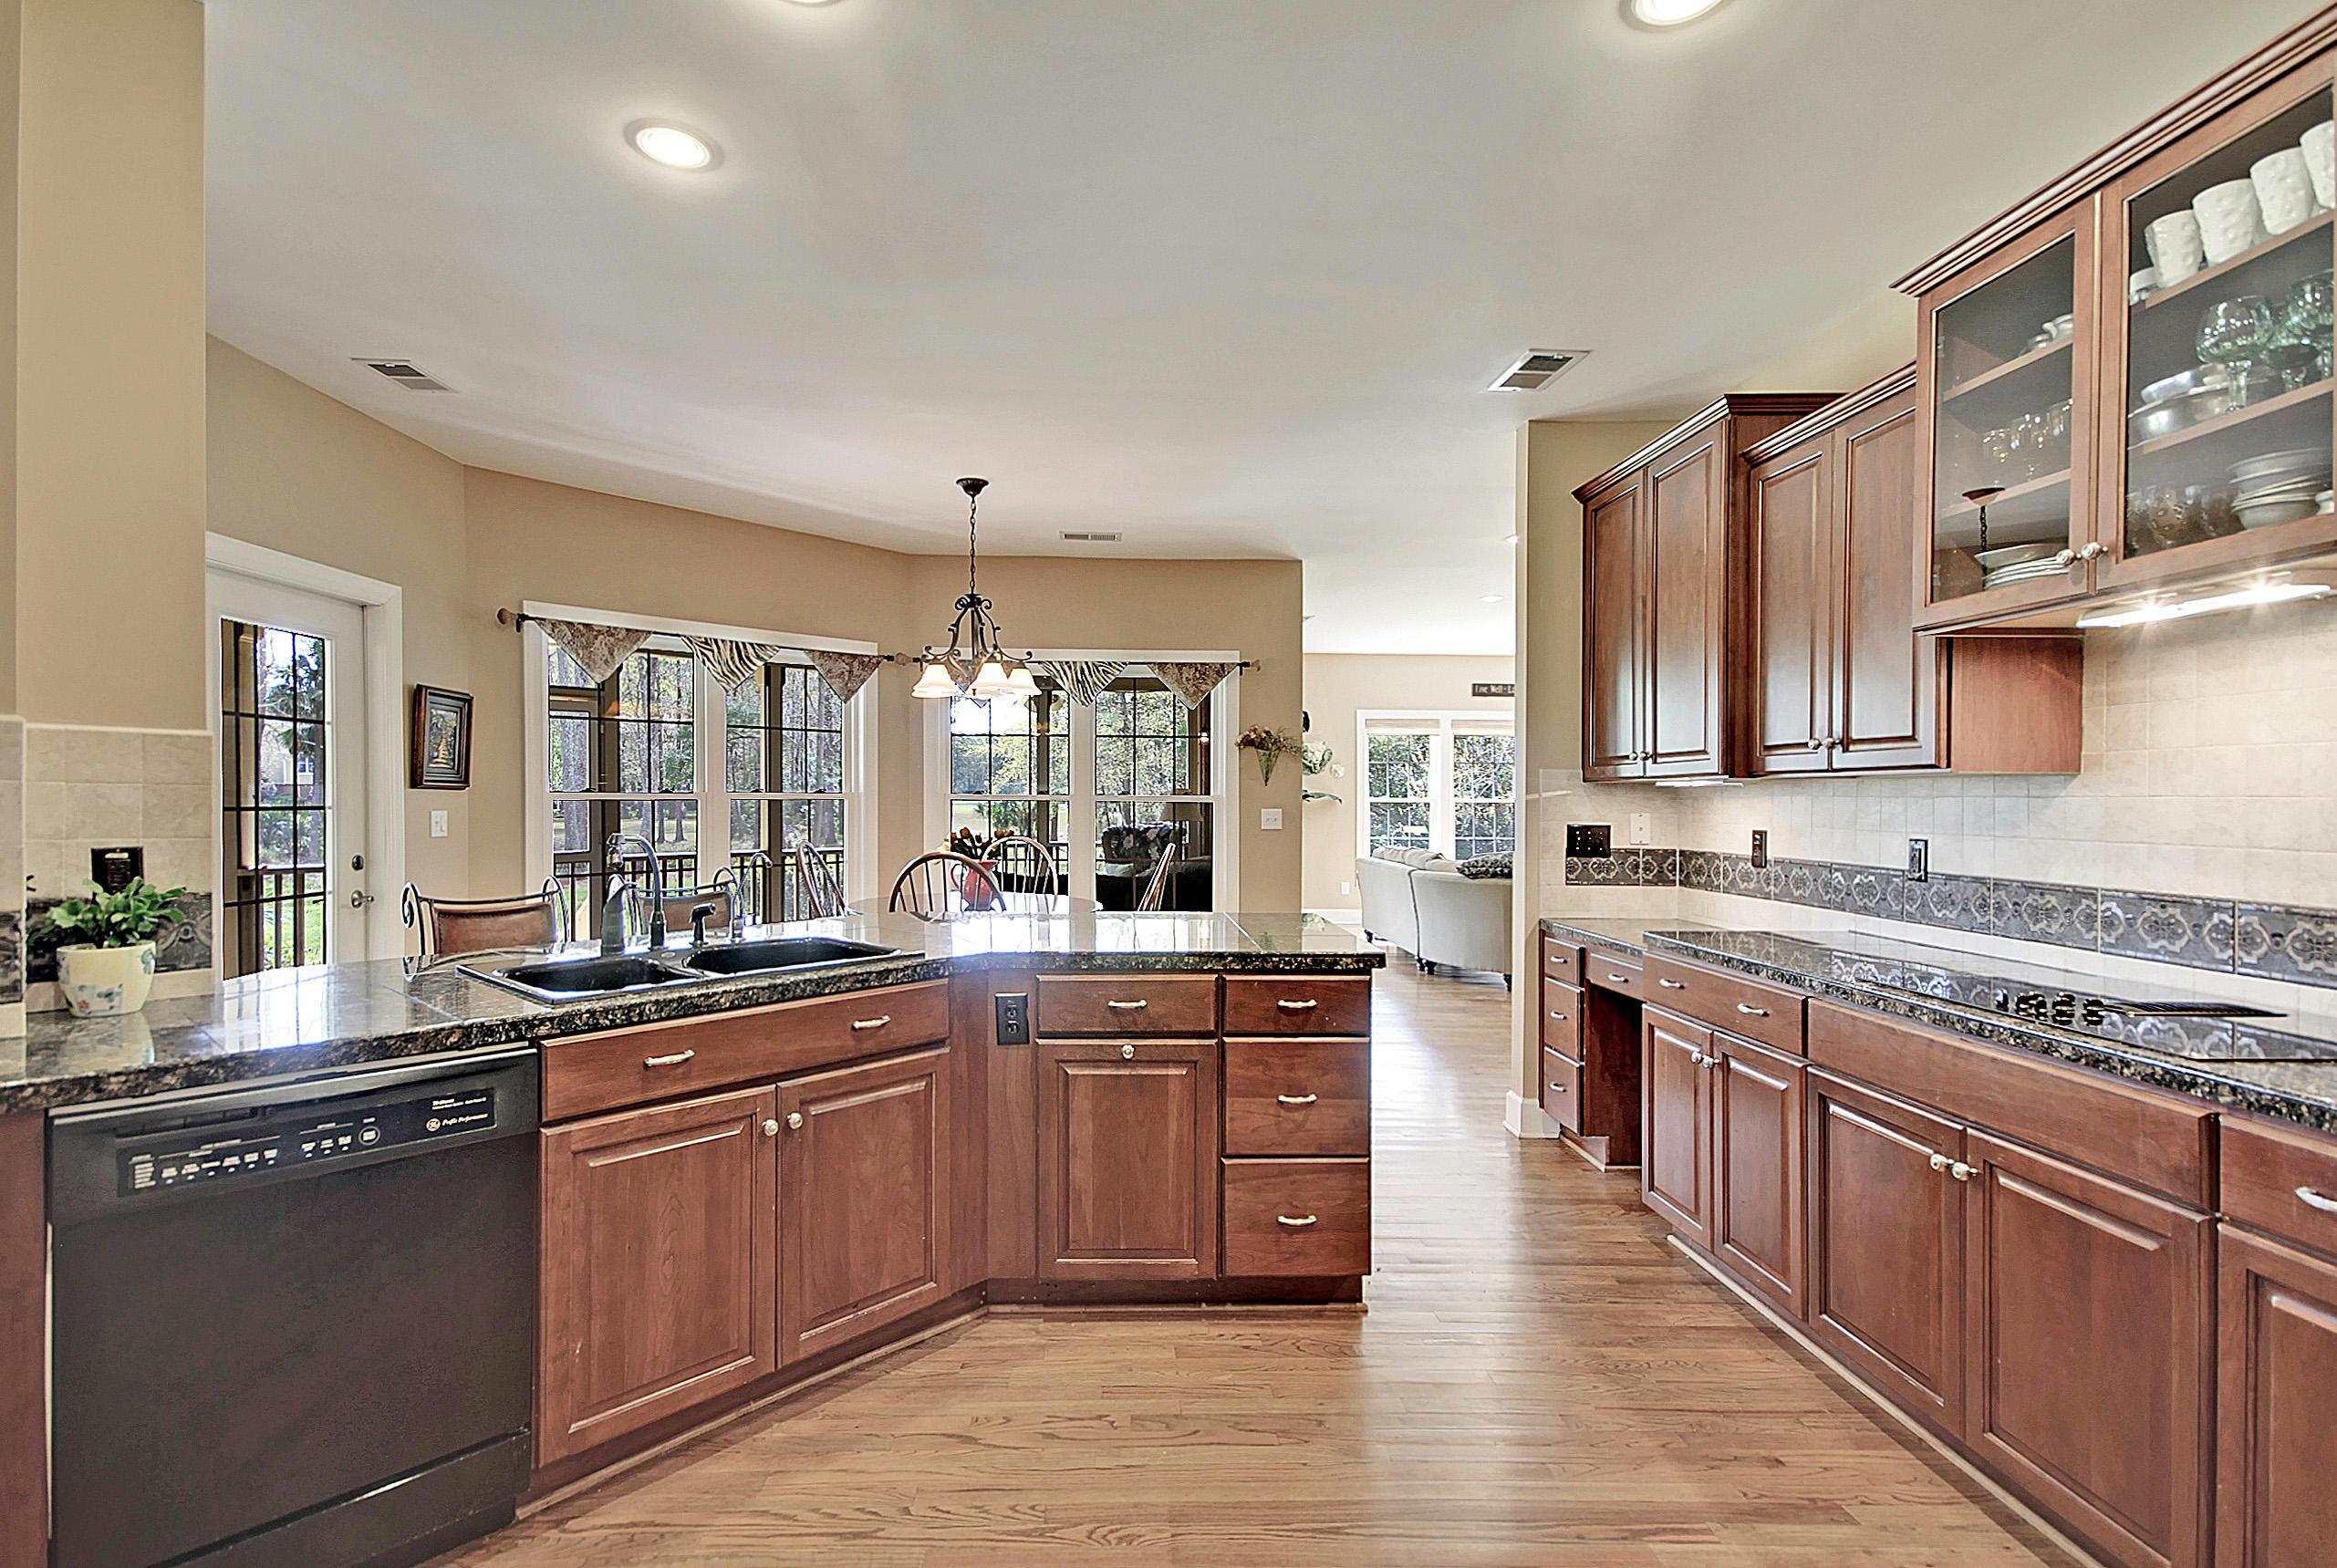 Dunes West Homes For Sale - 4002 Colonel Vanderhorst, Mount Pleasant, SC - 15